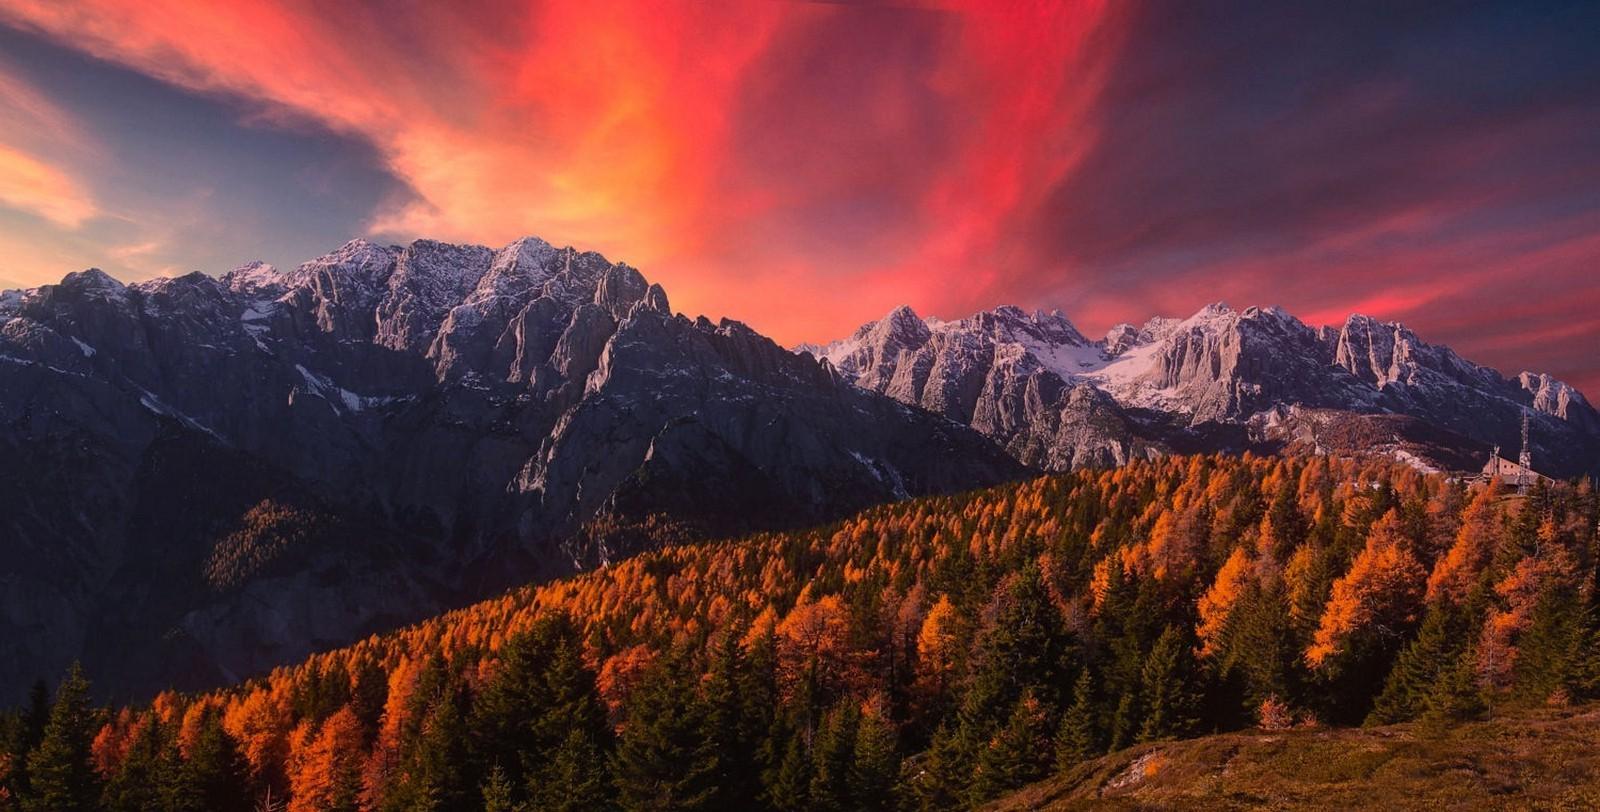 Fall Scenery Hd Wallpaper Nature Landscape Alps Mountains Snowy Peak Sunset